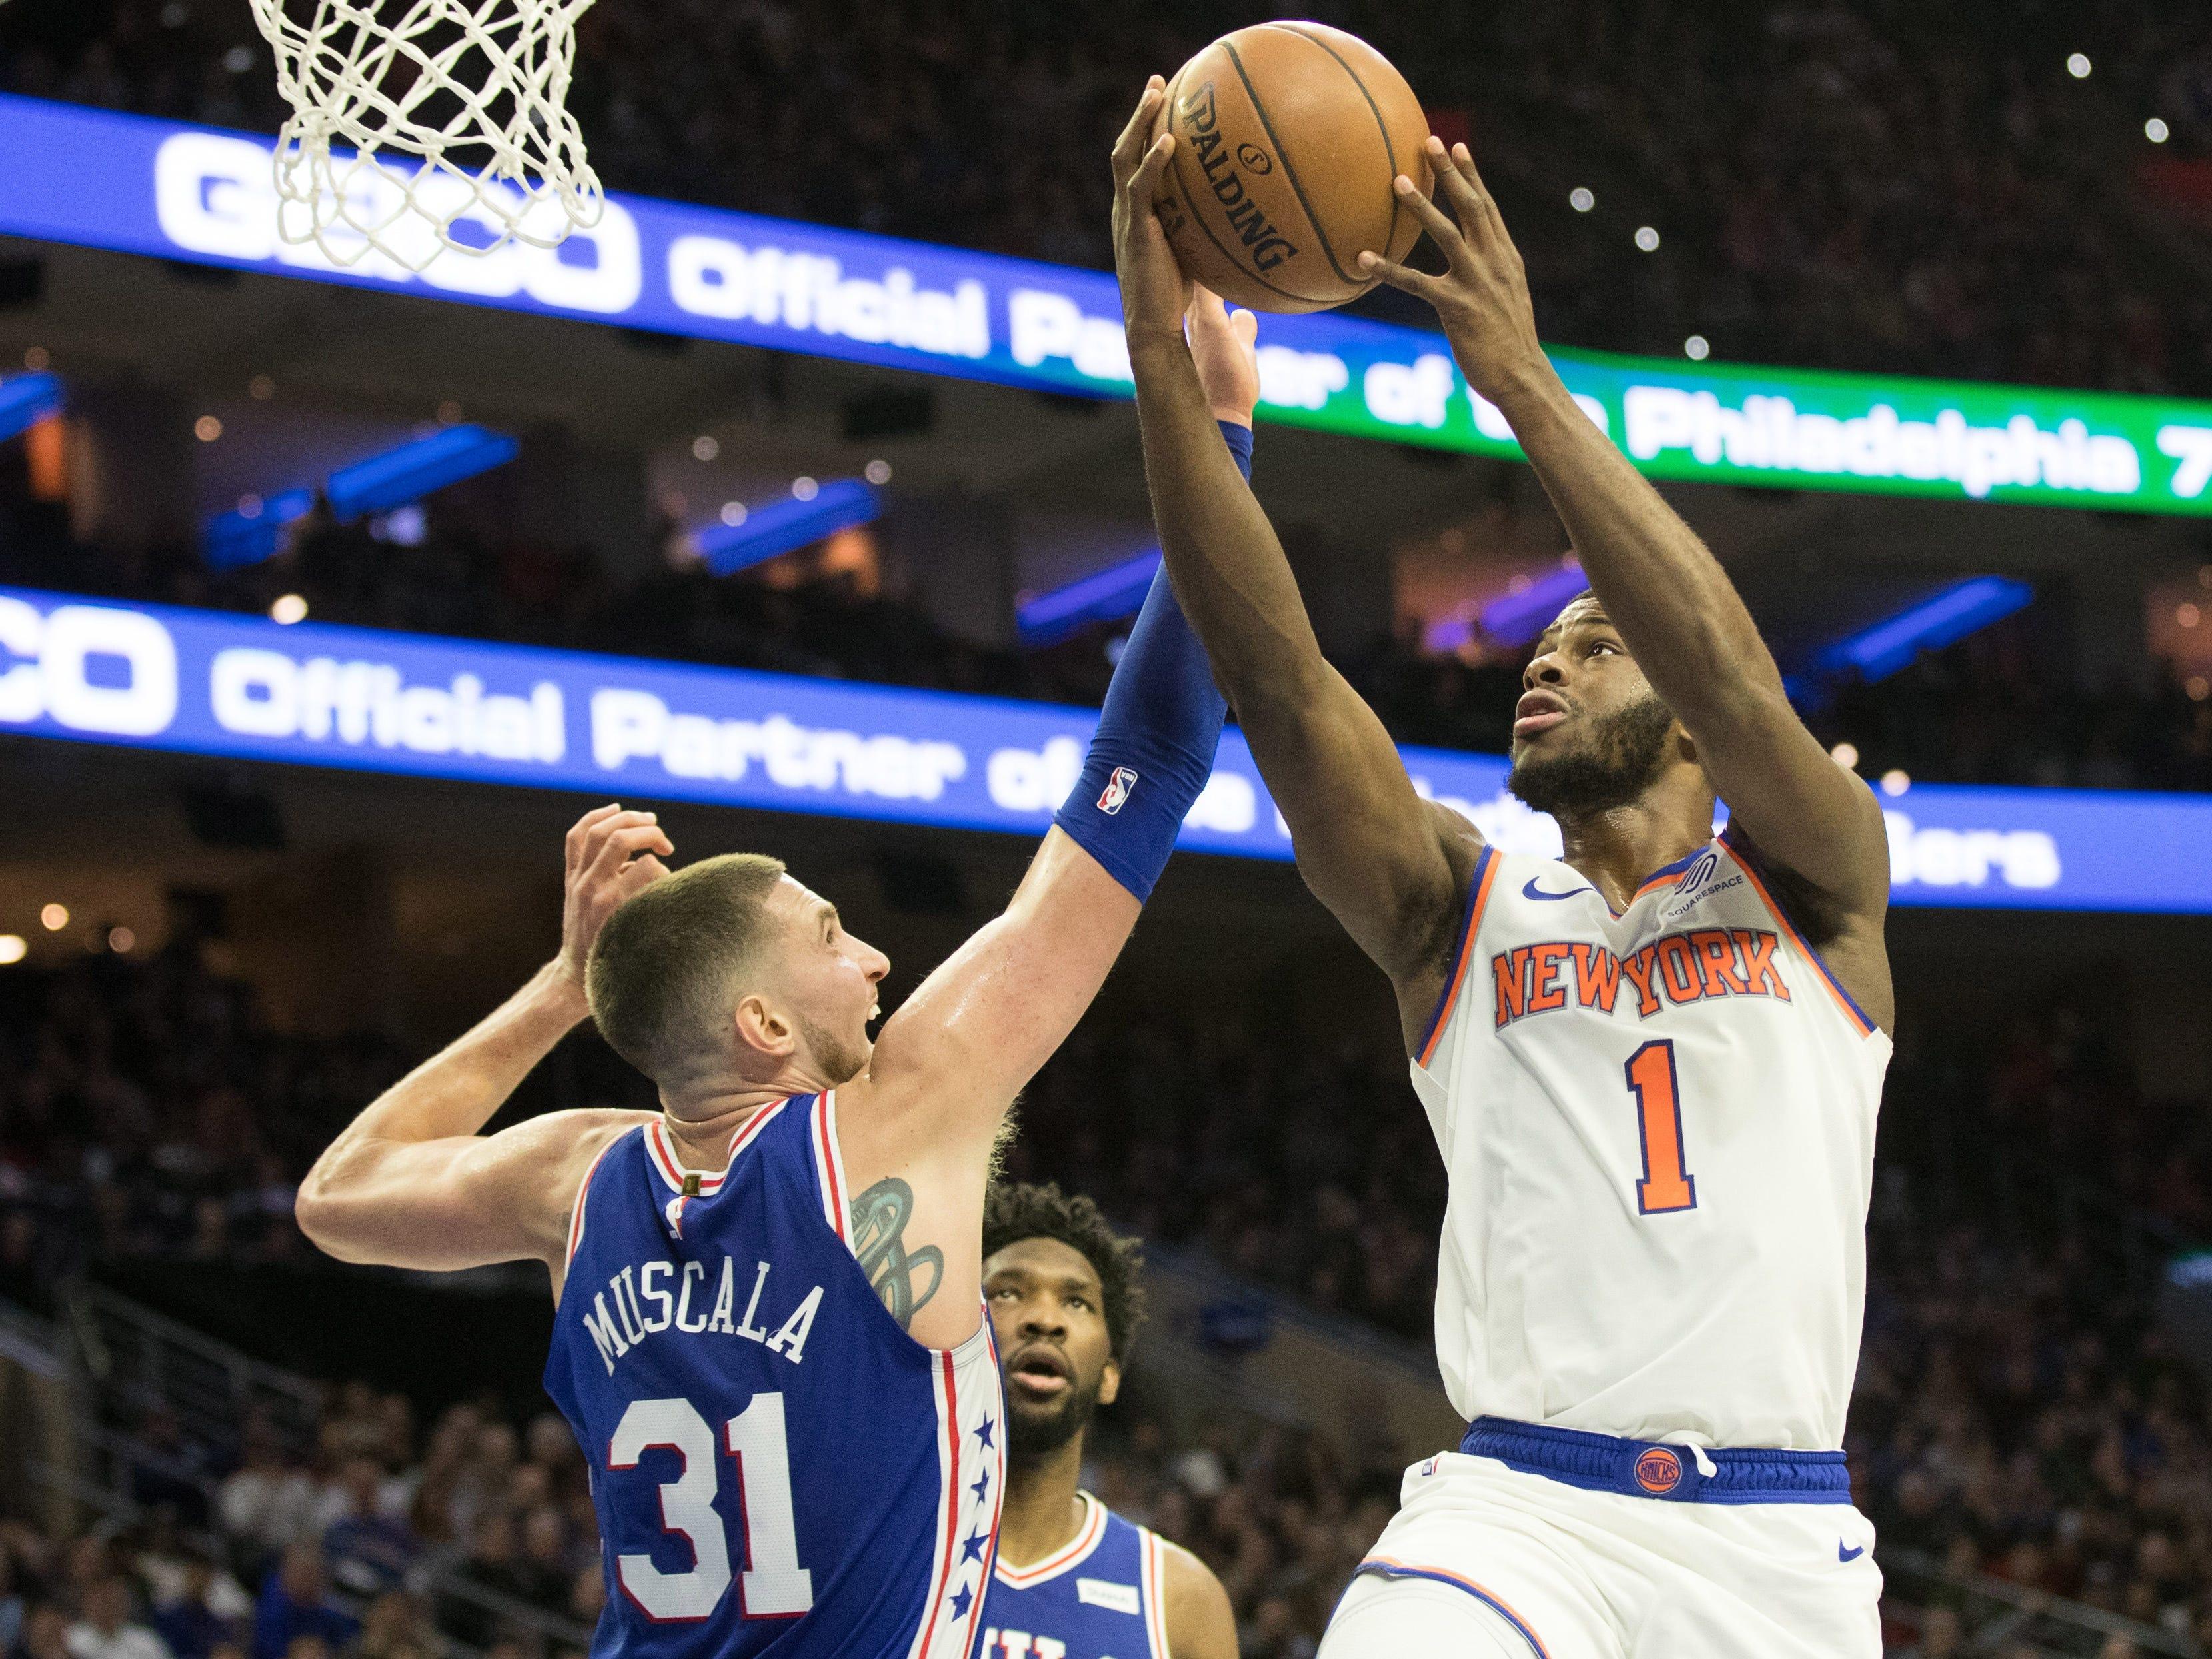 Dec 19, 2018; Philadelphia, PA, USA; New York Knicks guard Emmanuel Mudiay (1) shoots as Philadelphia 76ers forward Mike Muscala (31) defends during the second quarter at Wells Fargo Center.